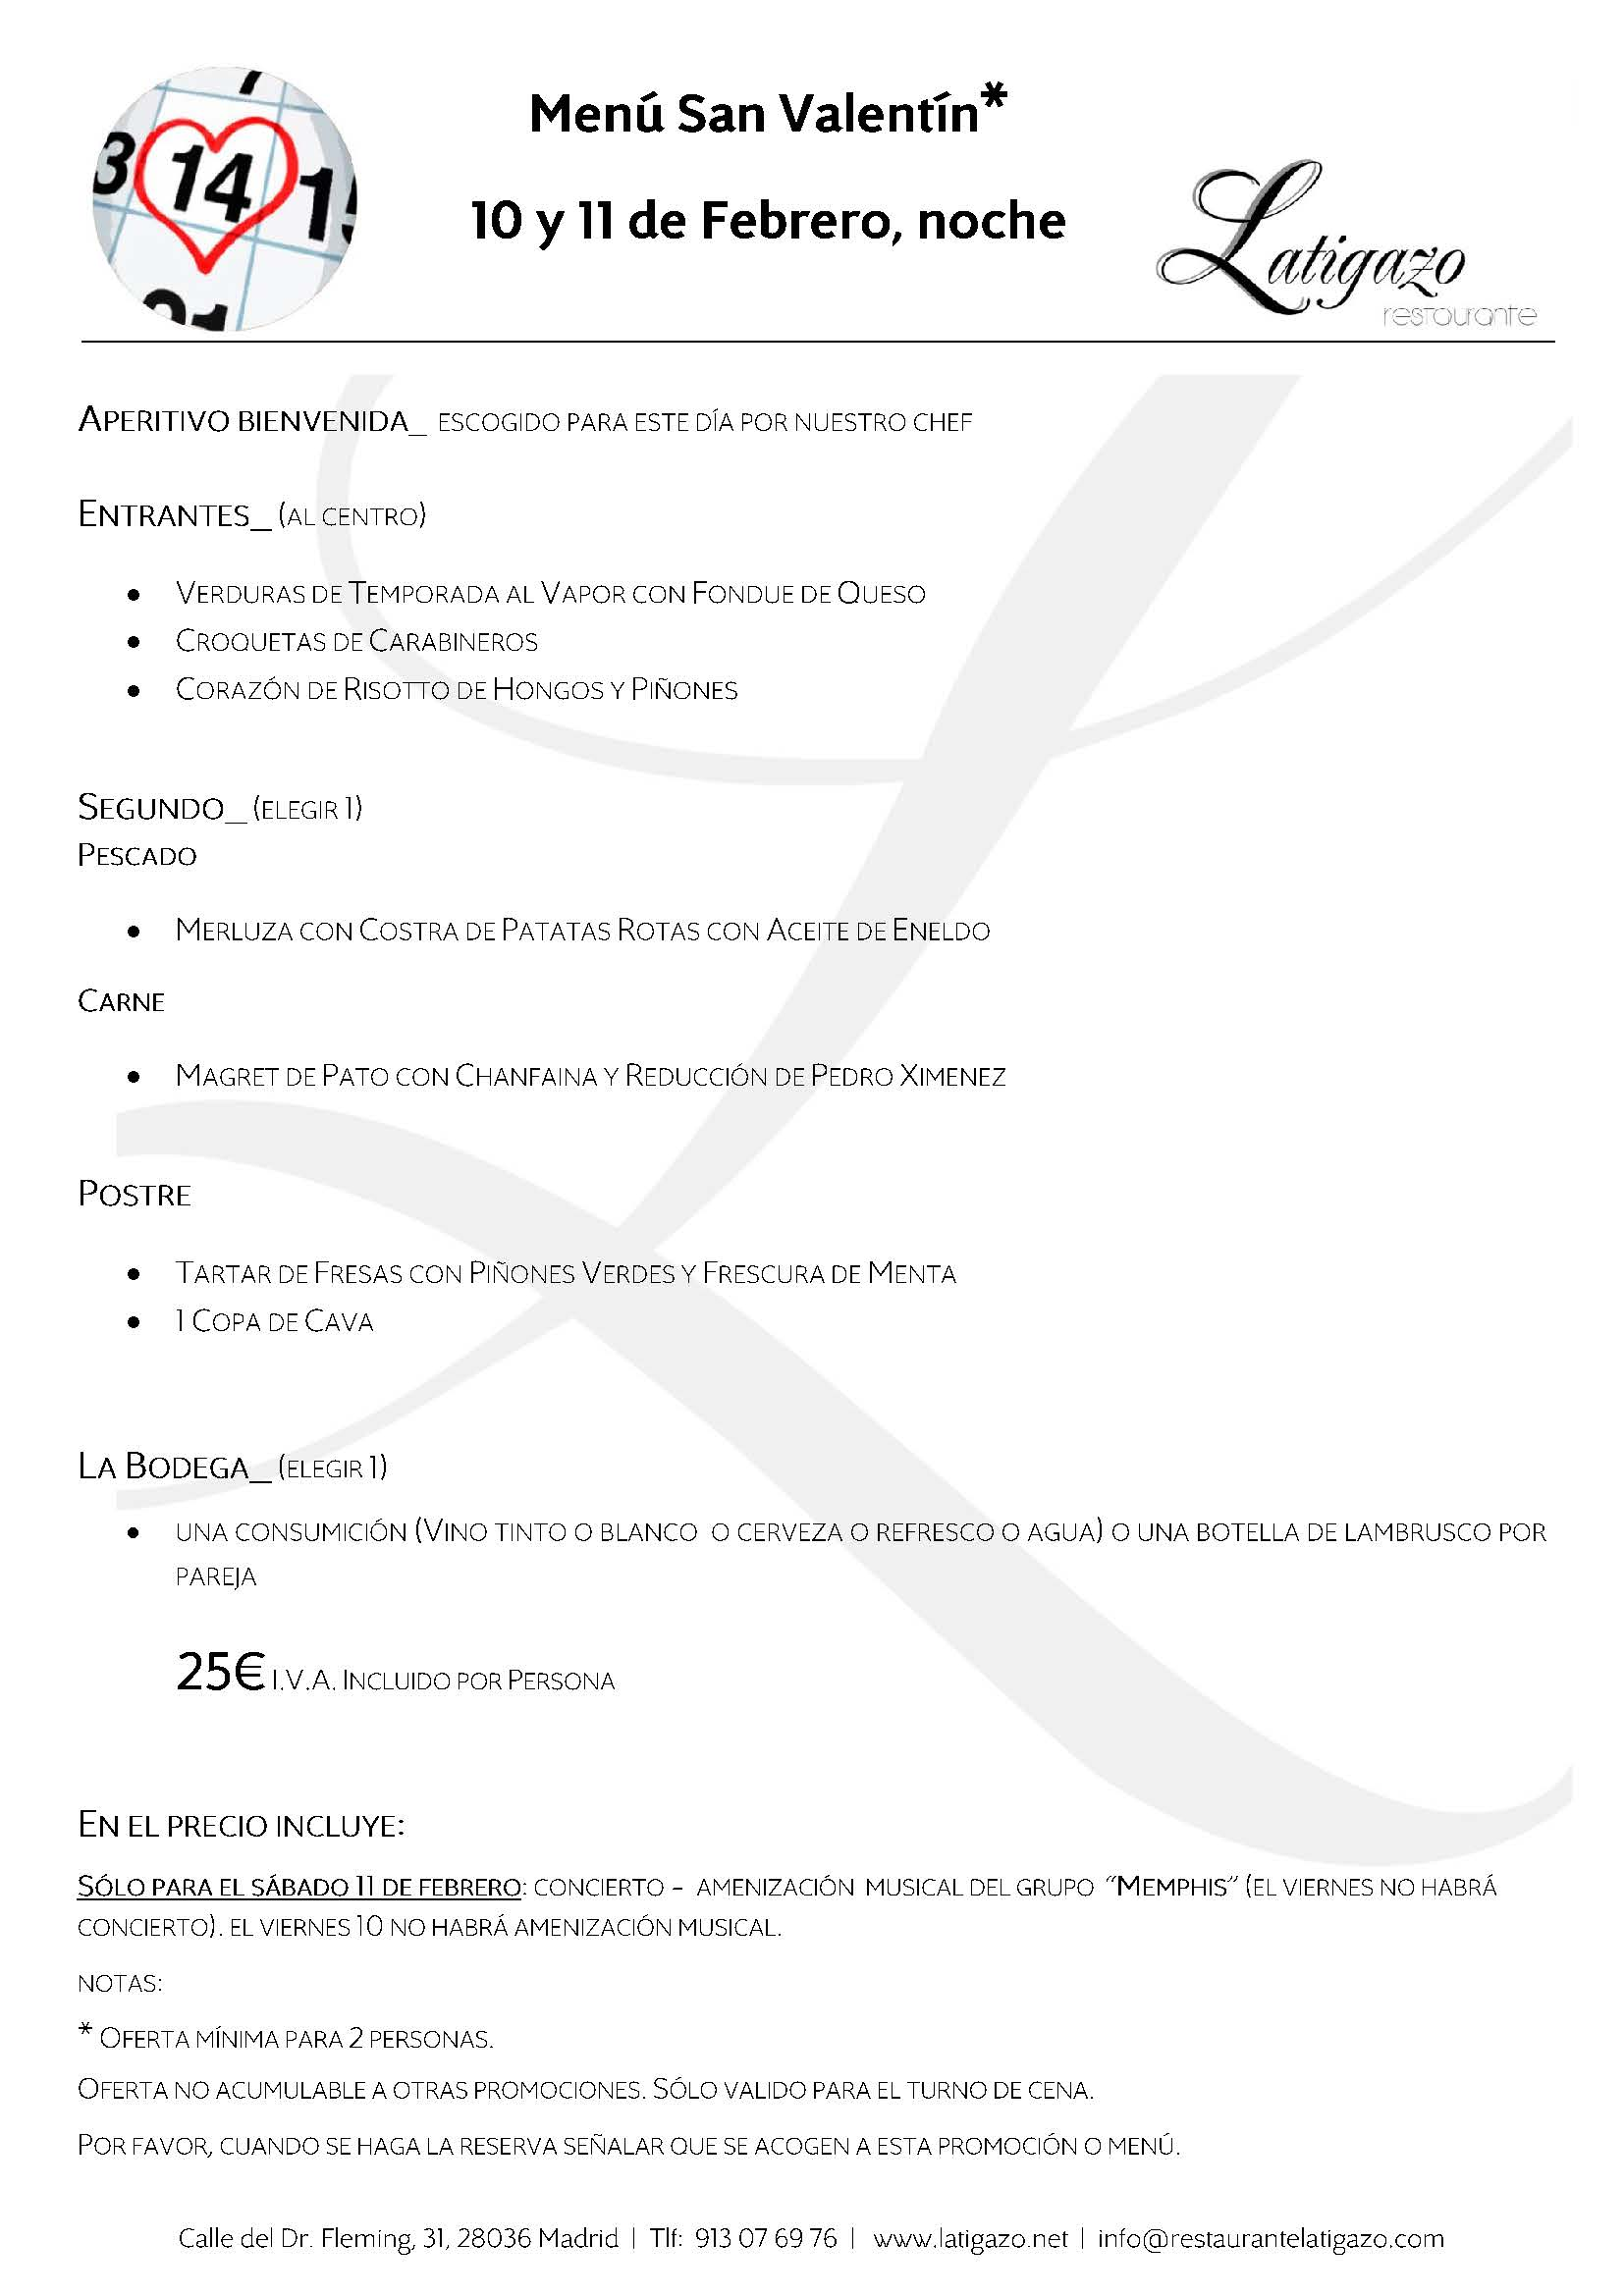 menu_SanValentin_Latigazo